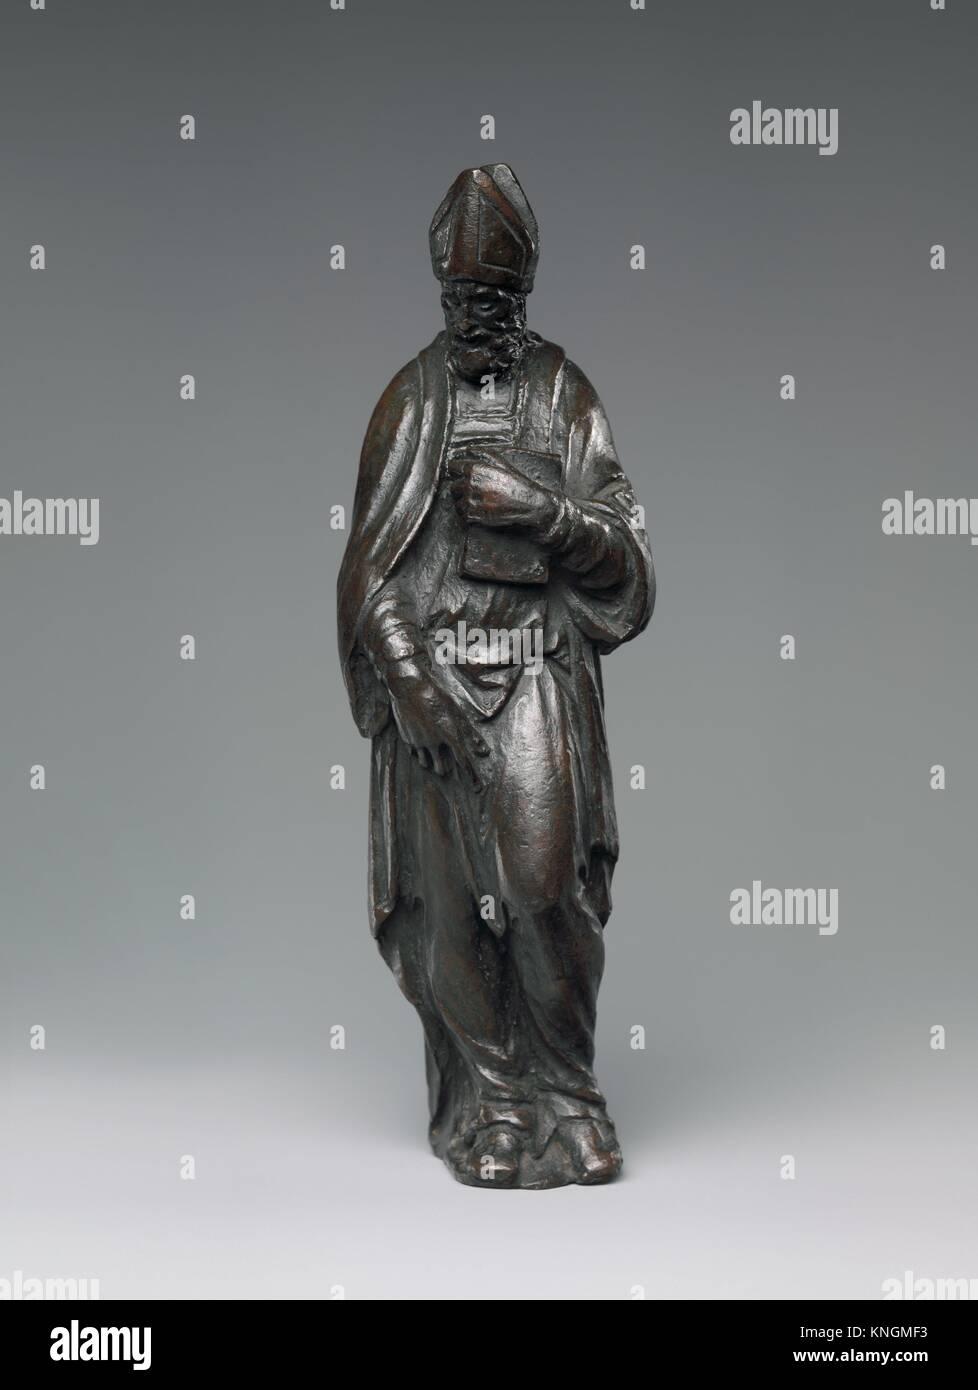 Saint Augustine. Artist: Style of Jacopo Sansovino (Jacopo Tatti) (Italian,